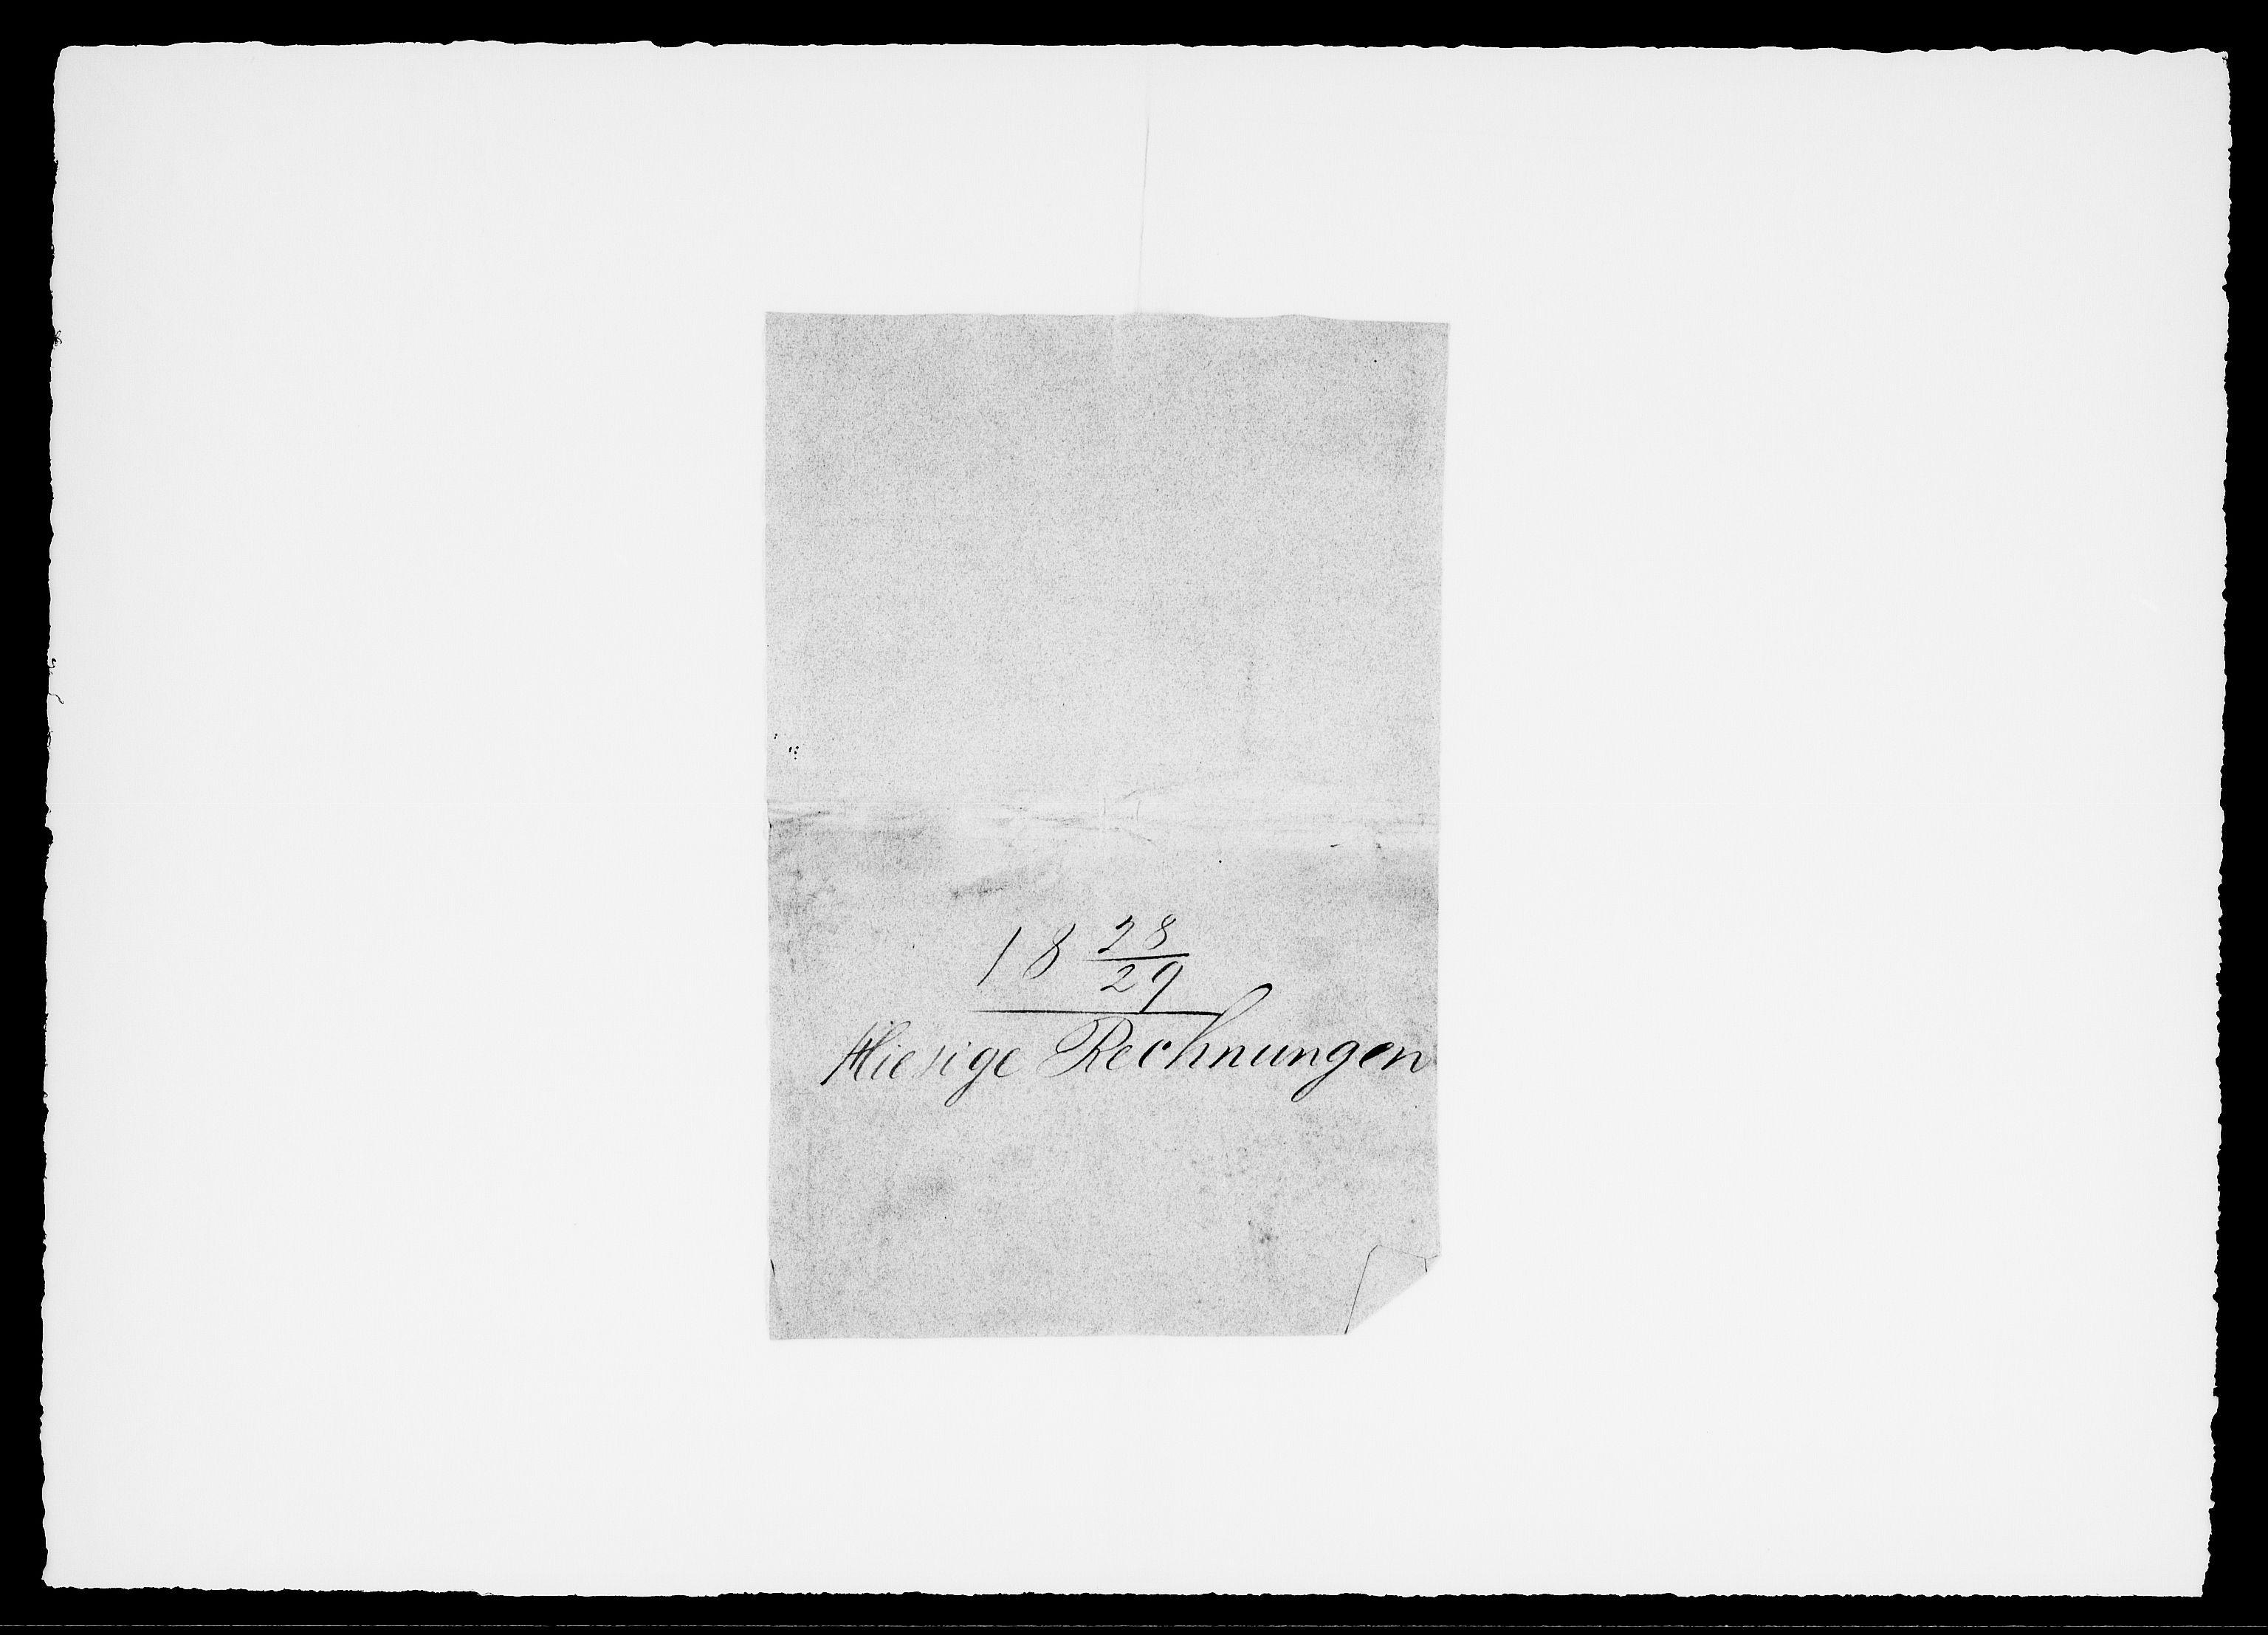 RA, Modums Blaafarveværk, G/Gd/Gdc/L0216, 1828-1831, s. 2